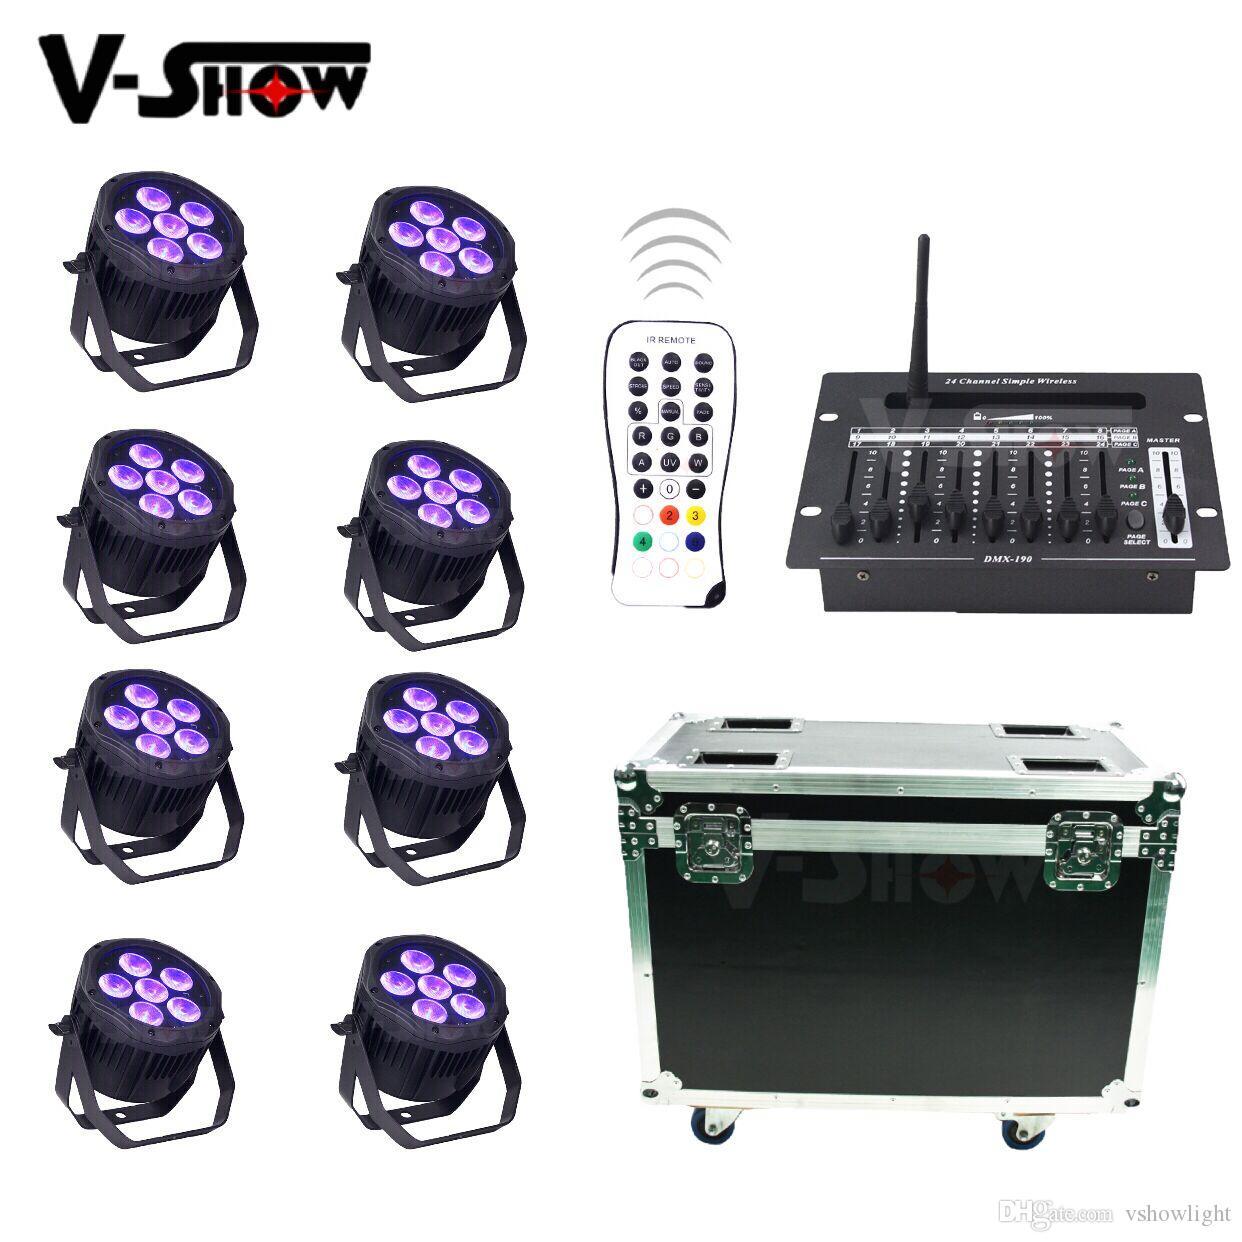 8pcs con 24CH Controlador DMX IP65 EXTERIOR 6x18W batería RGBWA + UV LED 6en1 iluminación hacia arriba inalámbrica par LED para la iluminación de bodas Hotel